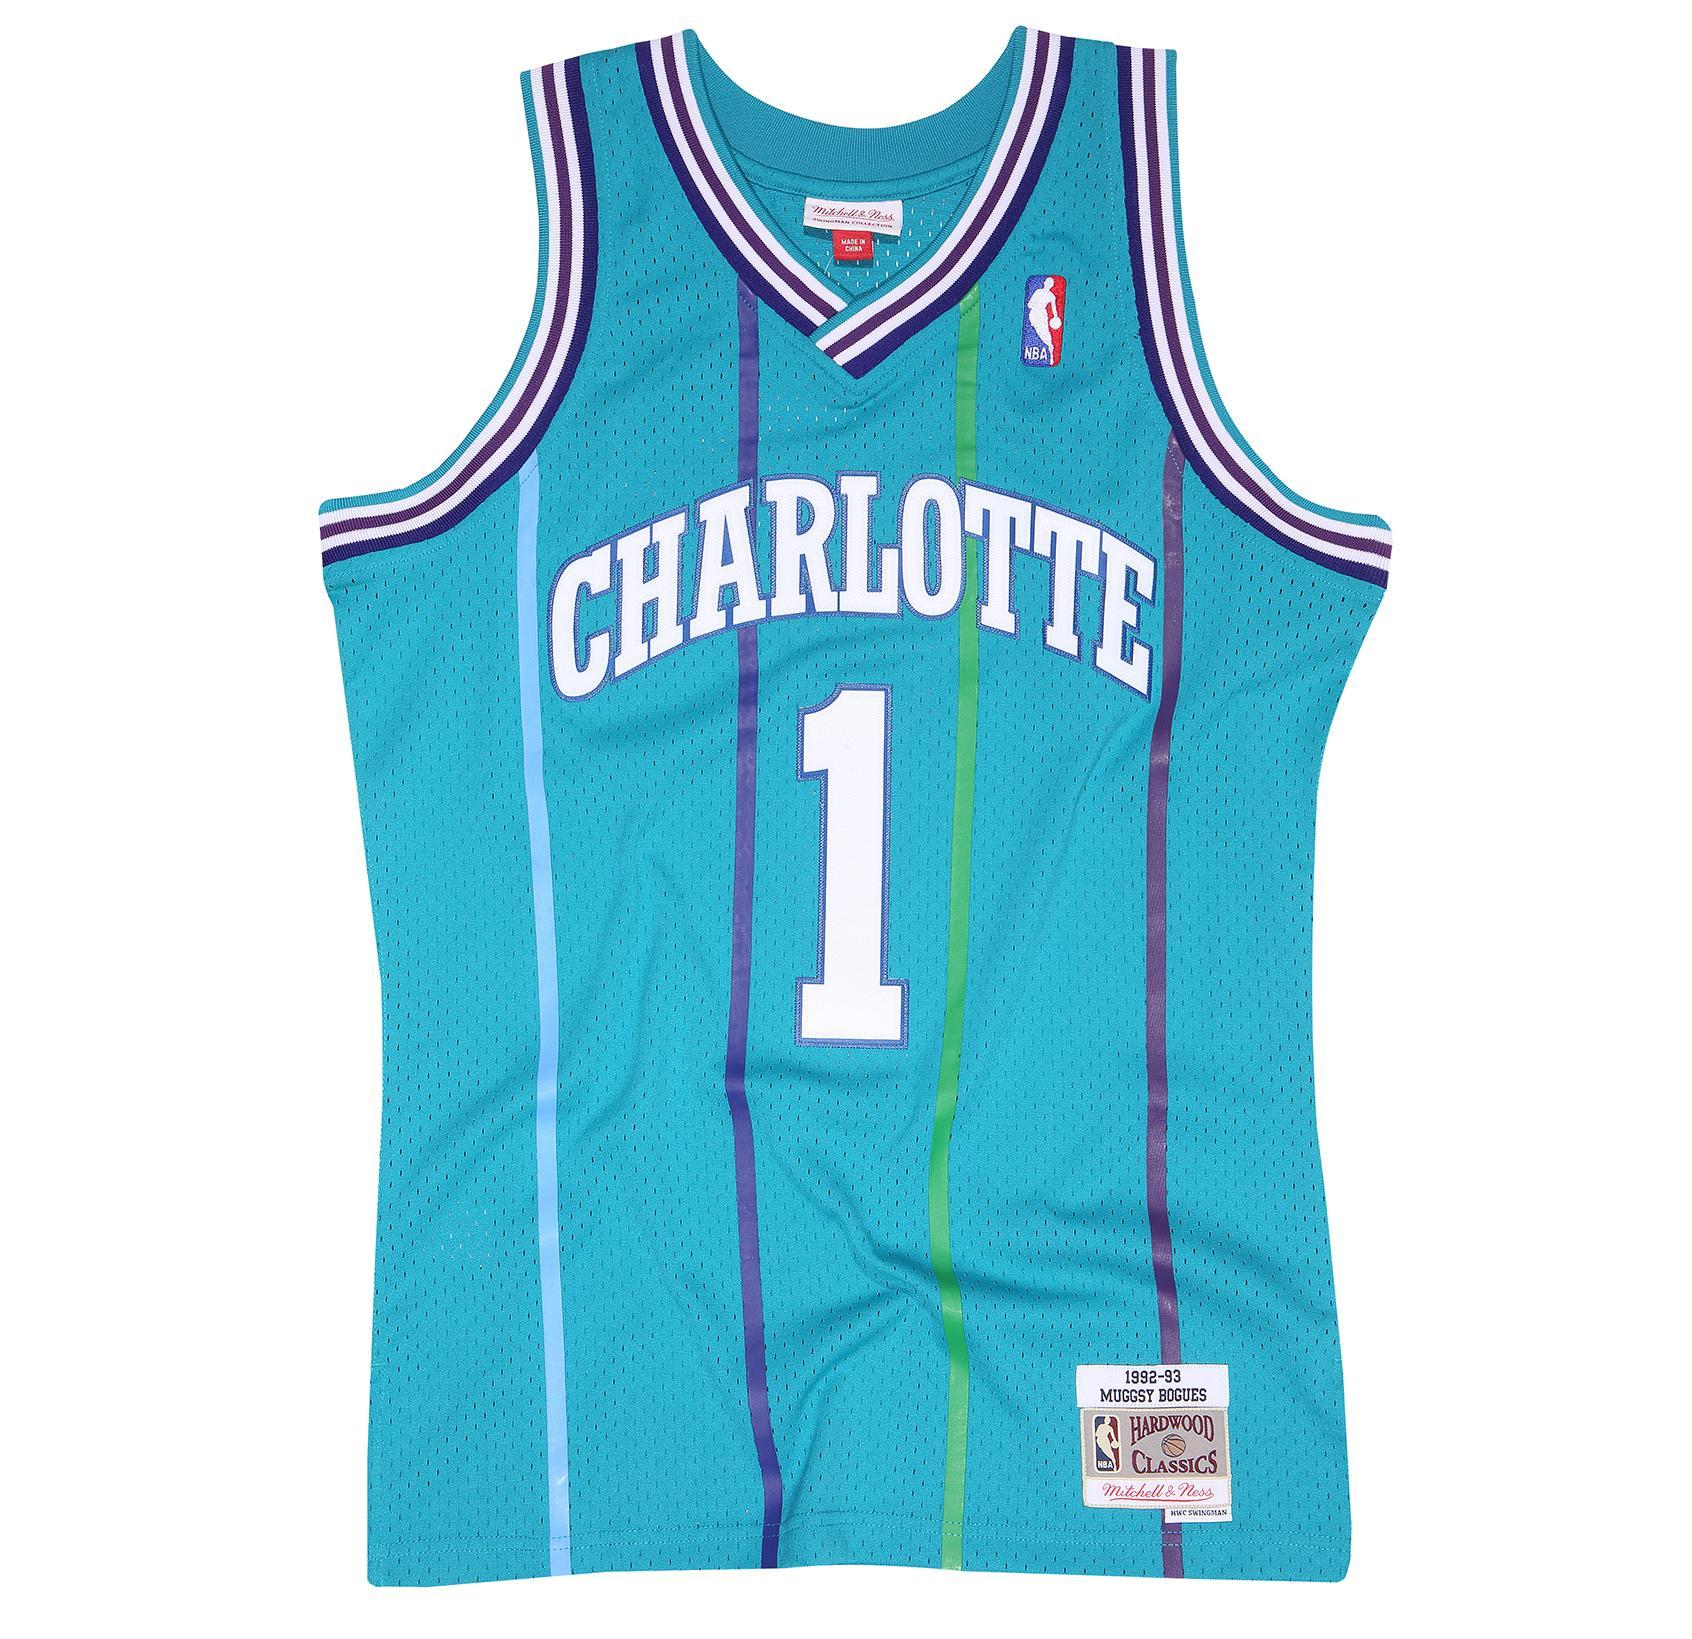 4a9a3a2c5 Muggsy Bogues 1992-93 Swingman Jersey Charlotte Hornets